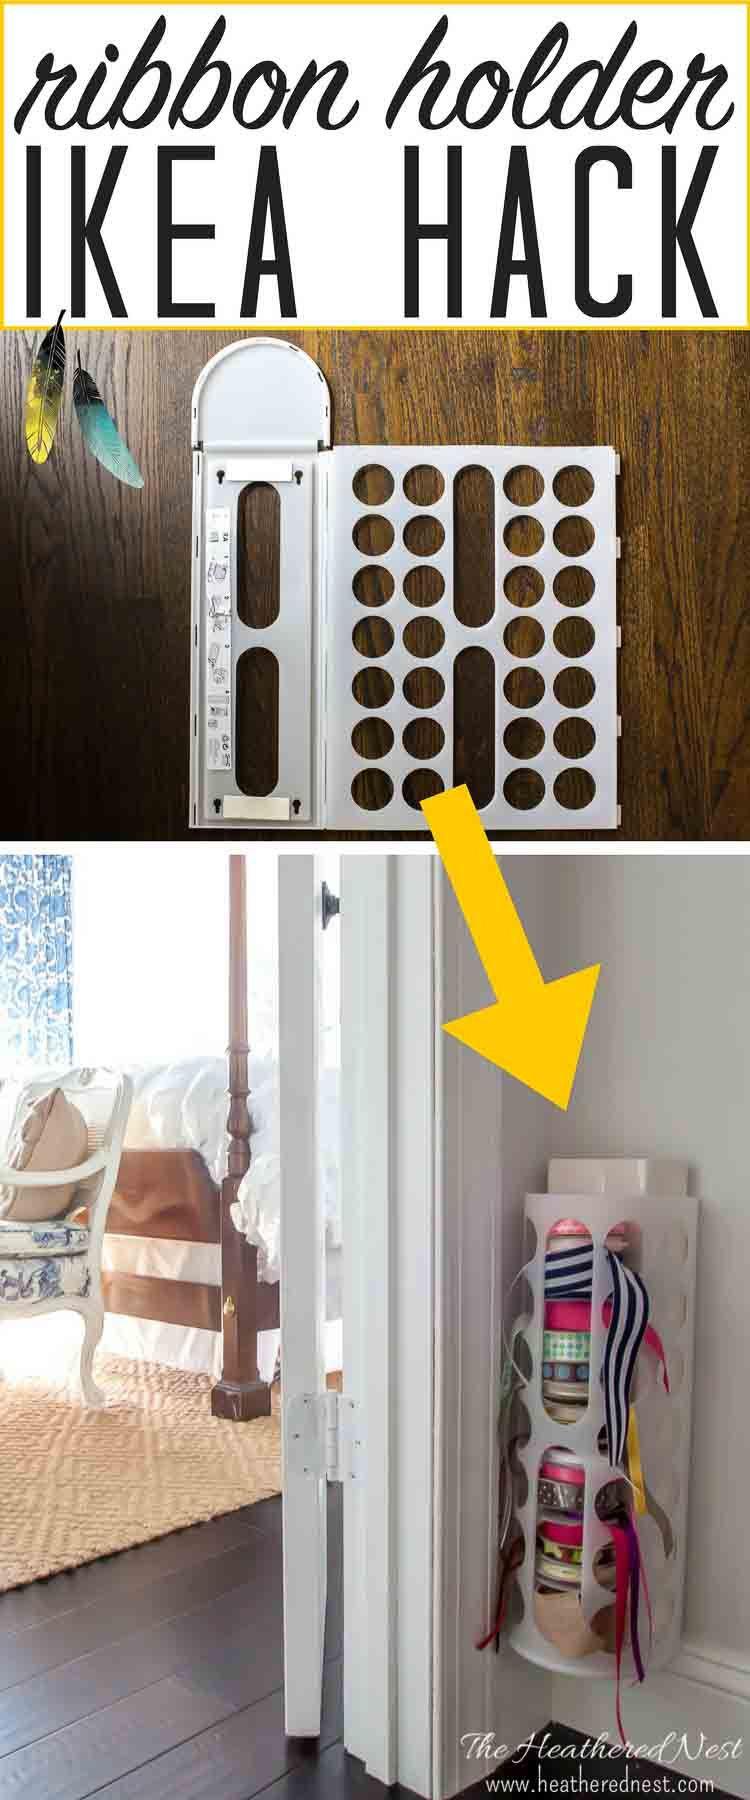 Diy Ikea Hacks  DIY ribbon holder Ikea hack Hometalk DIY